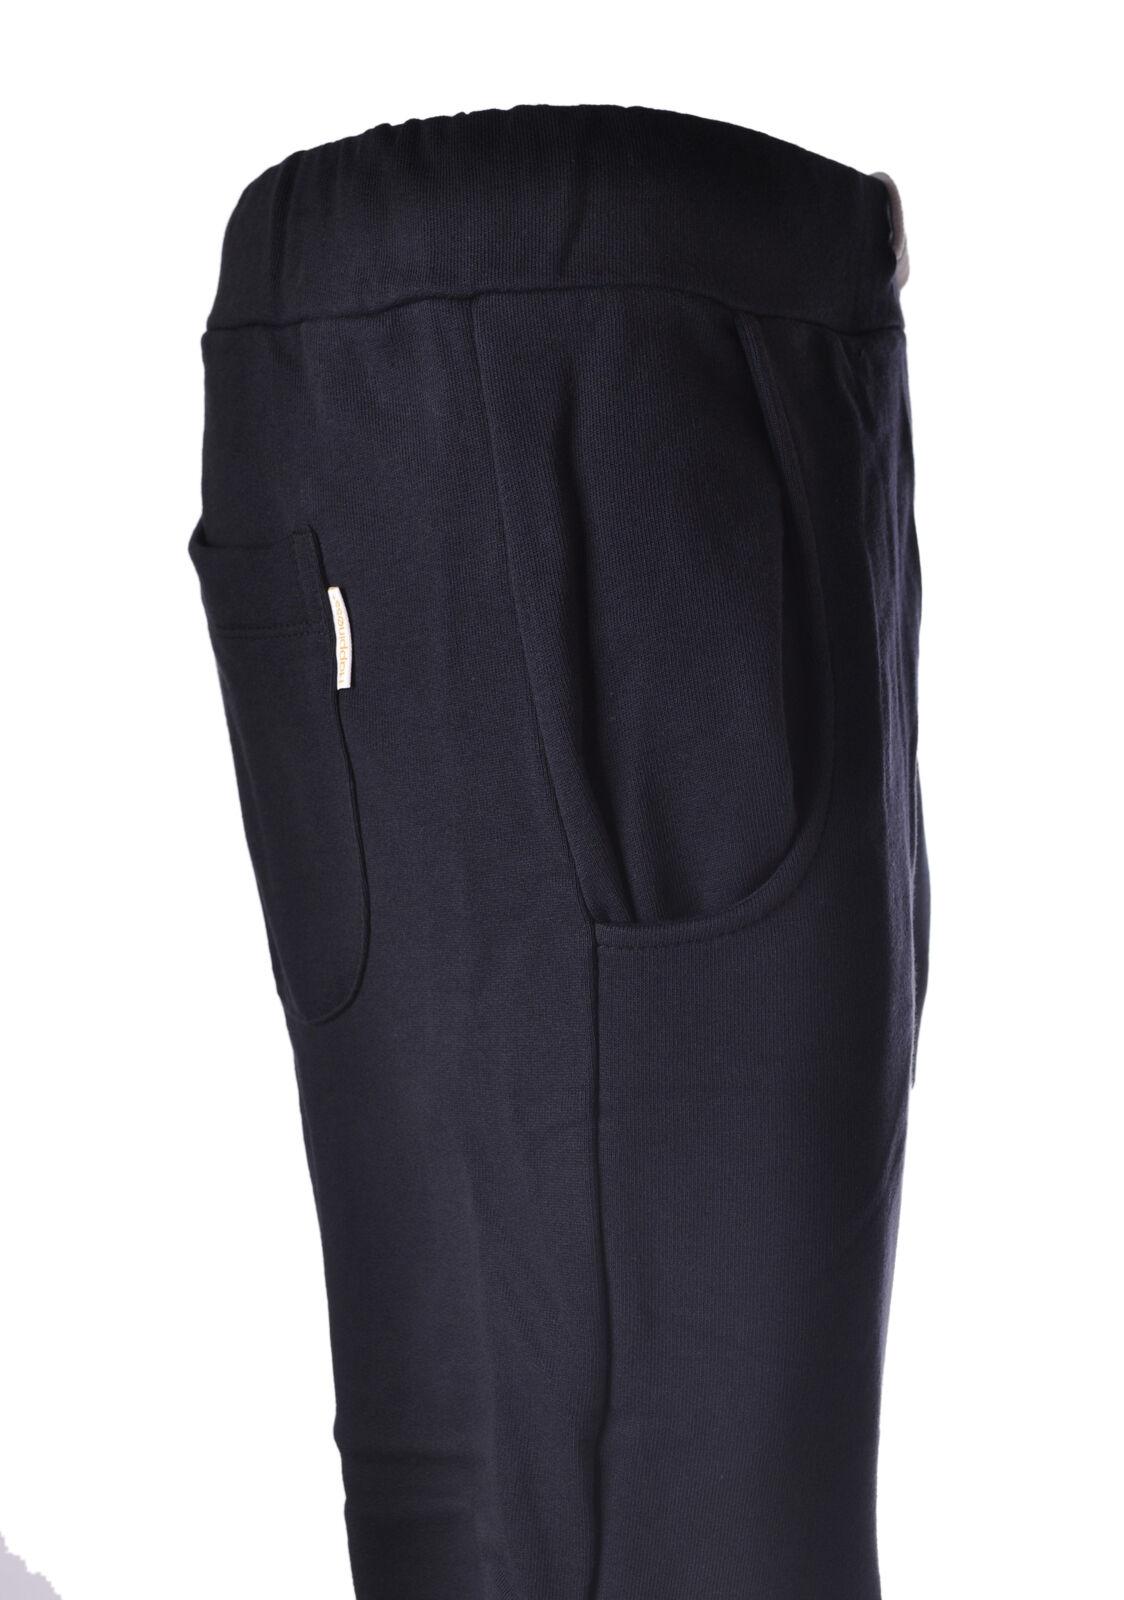 Happiness - Pants, Trousers, sweatshirt - Man - bluee - 4901204E184500